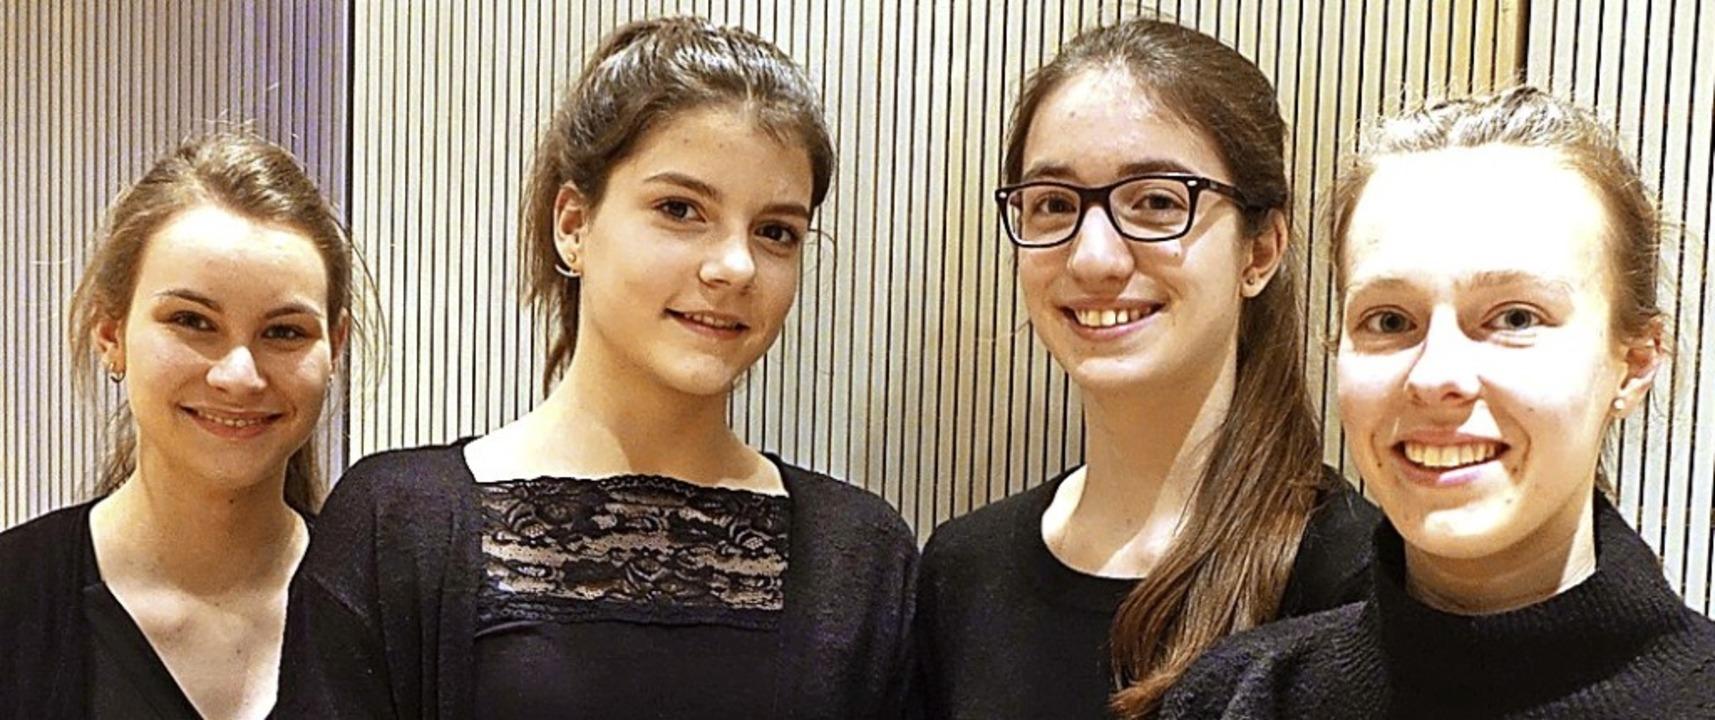 Sophia Eckert, Thea Sochor, Lena Berne... Berliner Philharmoniker zu besuchen.   | Foto: Frey